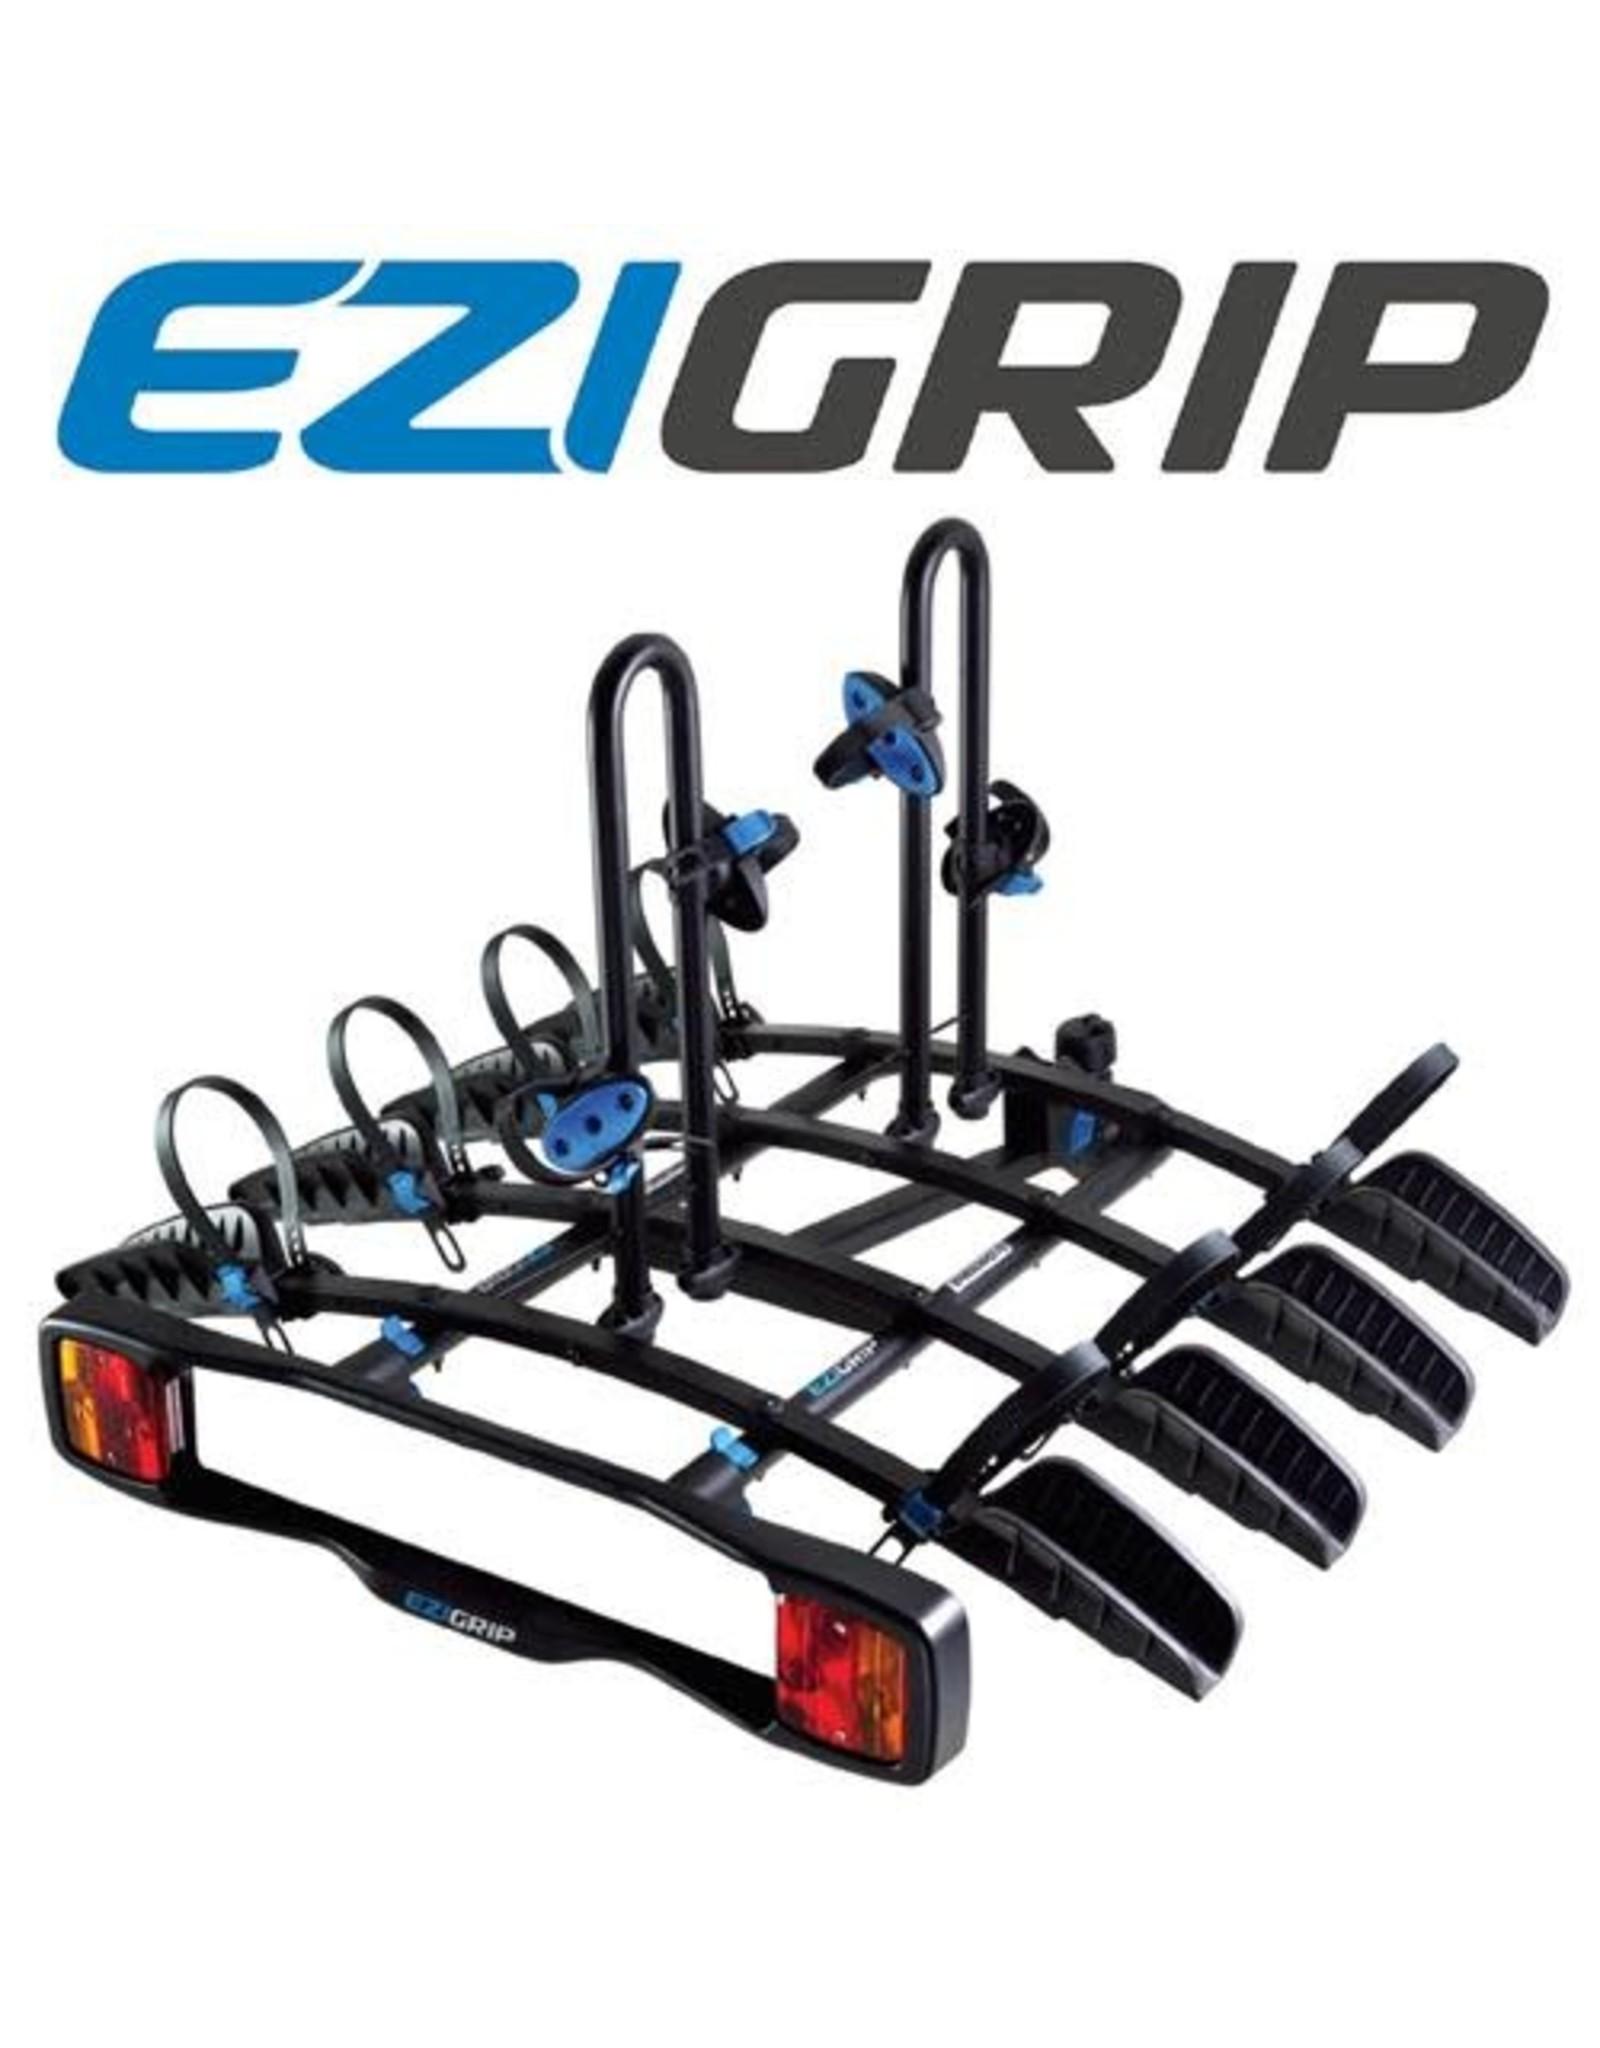 EZI GRIP EZIGRIP ENDURO 4 BIKE PLATFORM RACK TOE BALL W/LIGHTBOARD